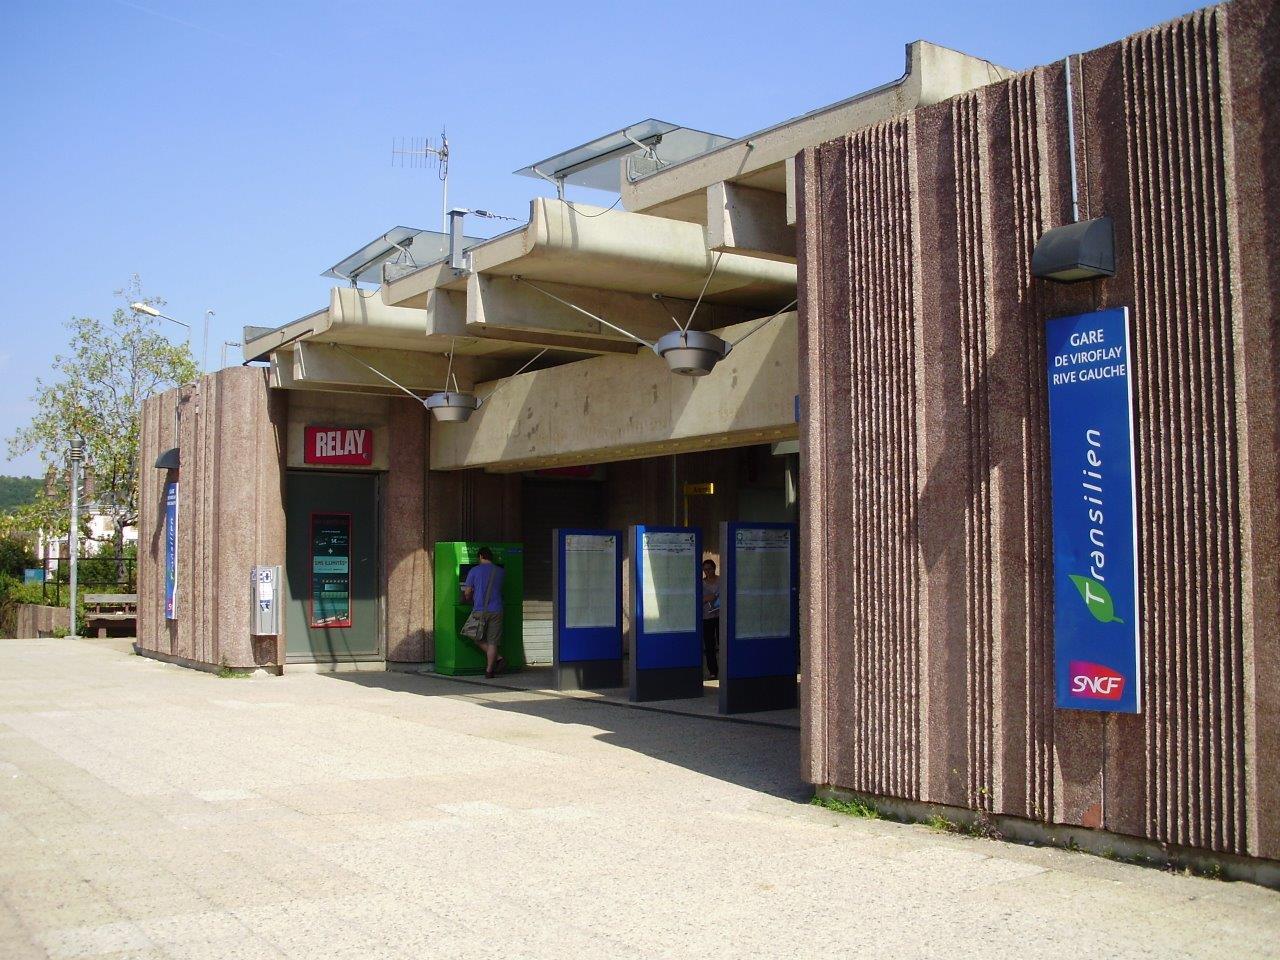 gare-de-viroflay-rive-gauche-train-station